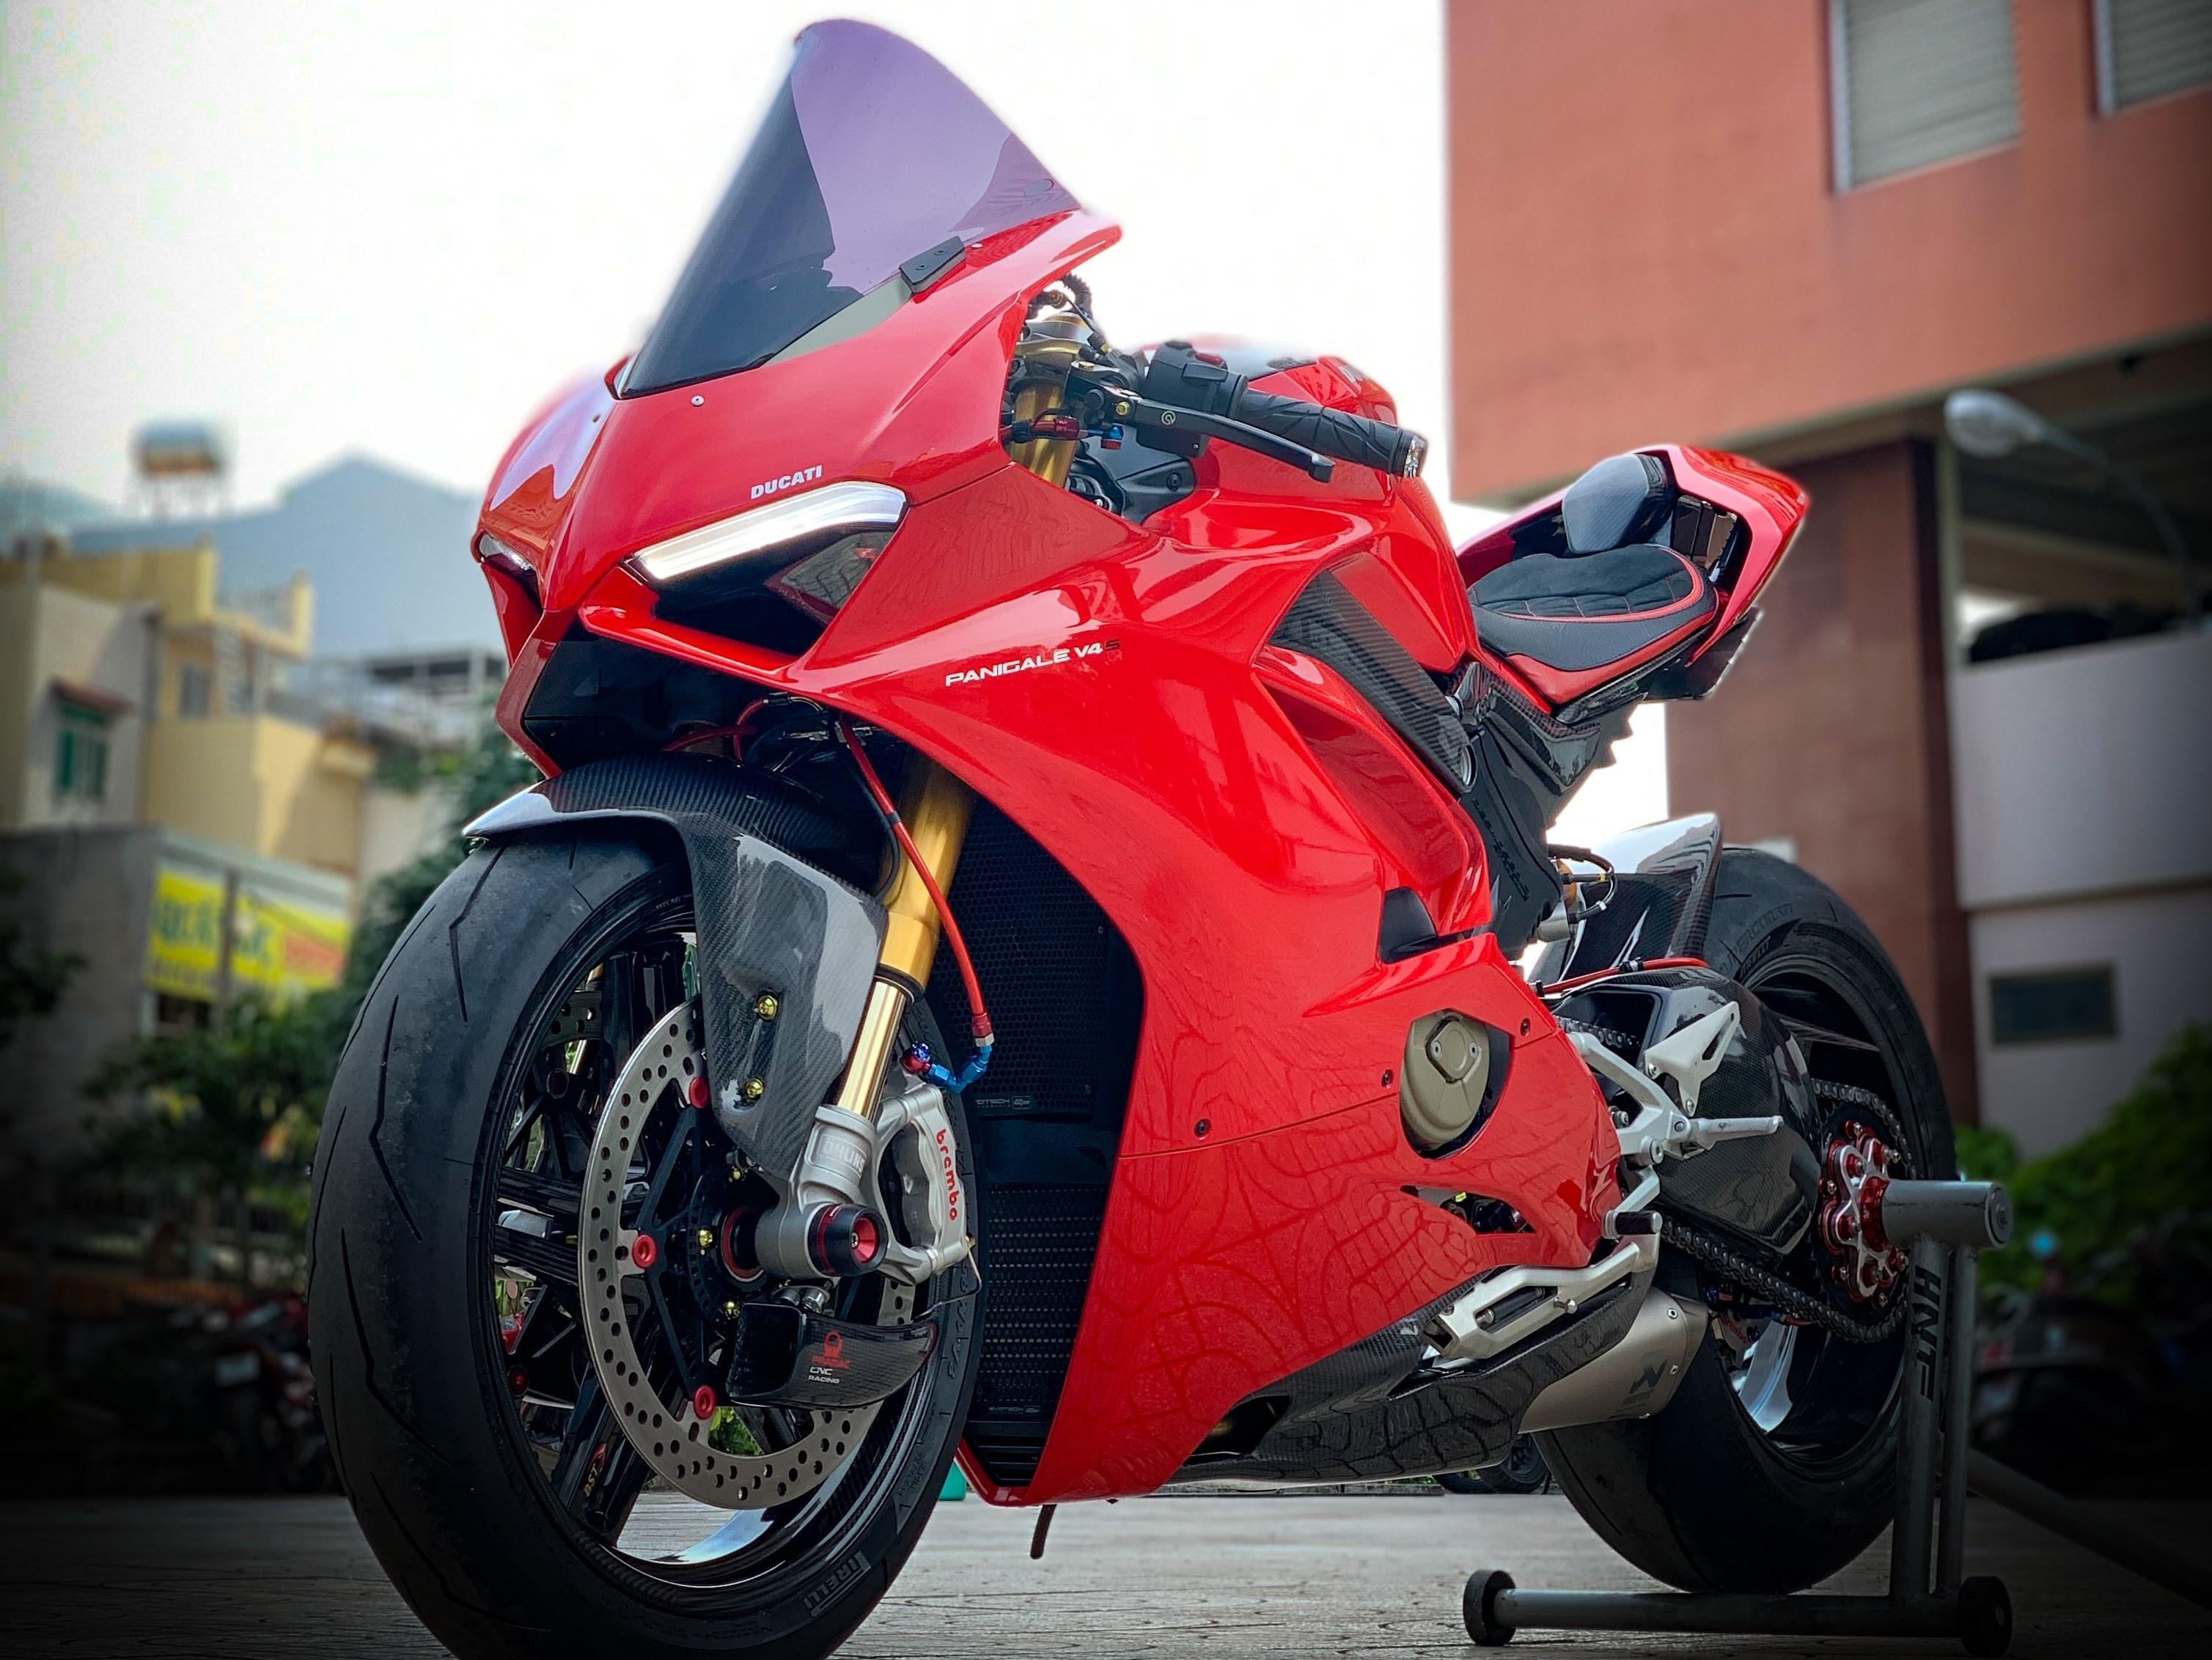 Moto tien ty Ducati Panigale V4 S voi goi do dat gia tai TP.HCM hinh anh 5 V4_9.jpeg